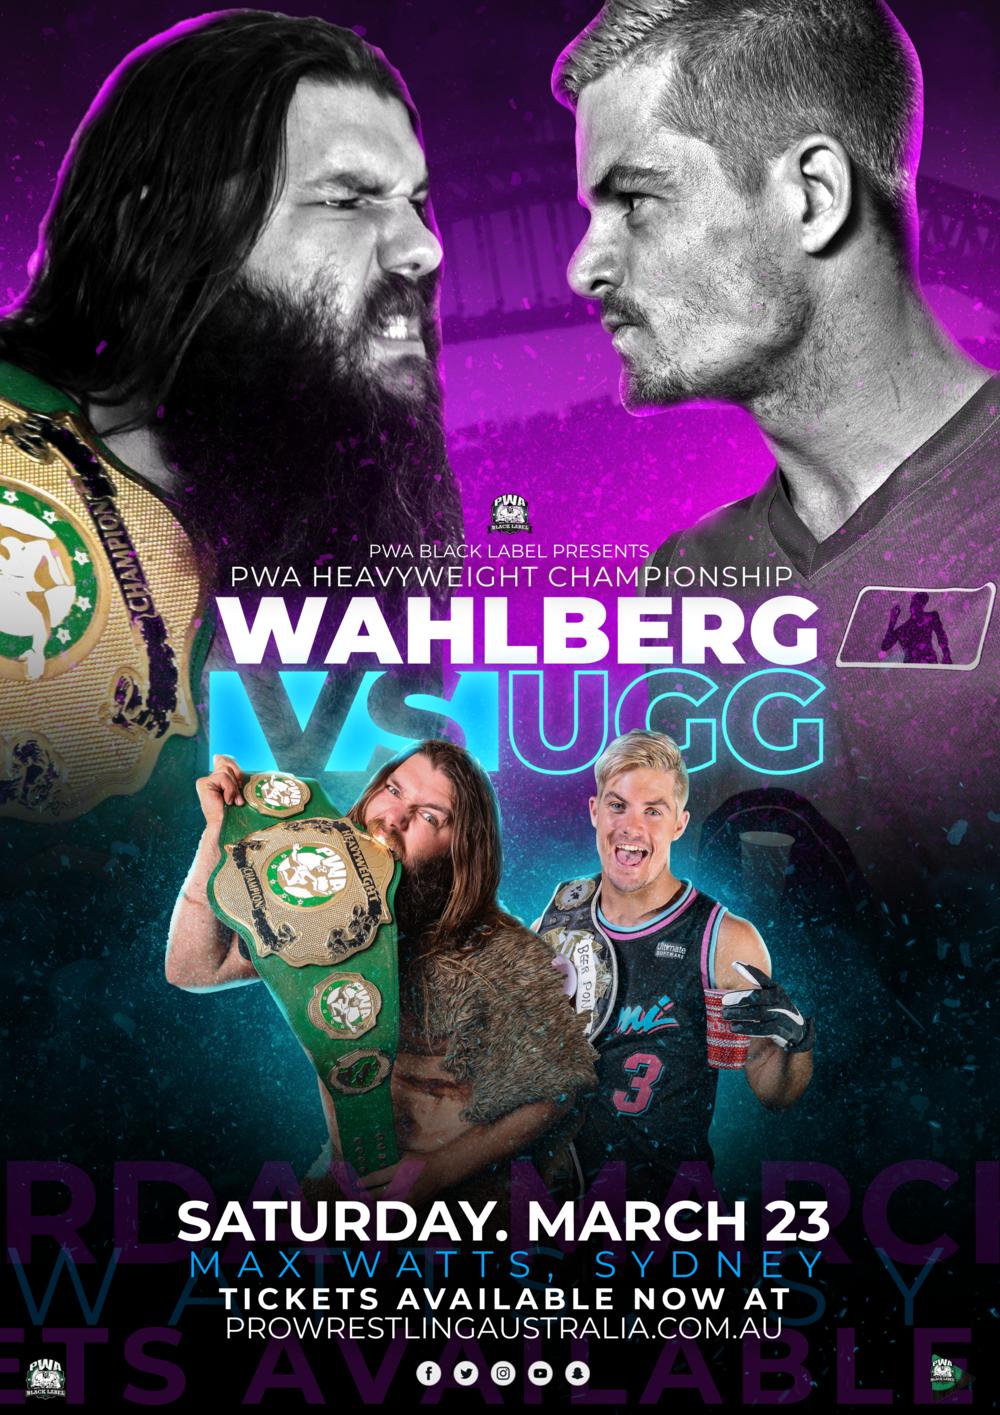 PWA Black Label Wahlberg Vs UGG A4 Poster 2.png